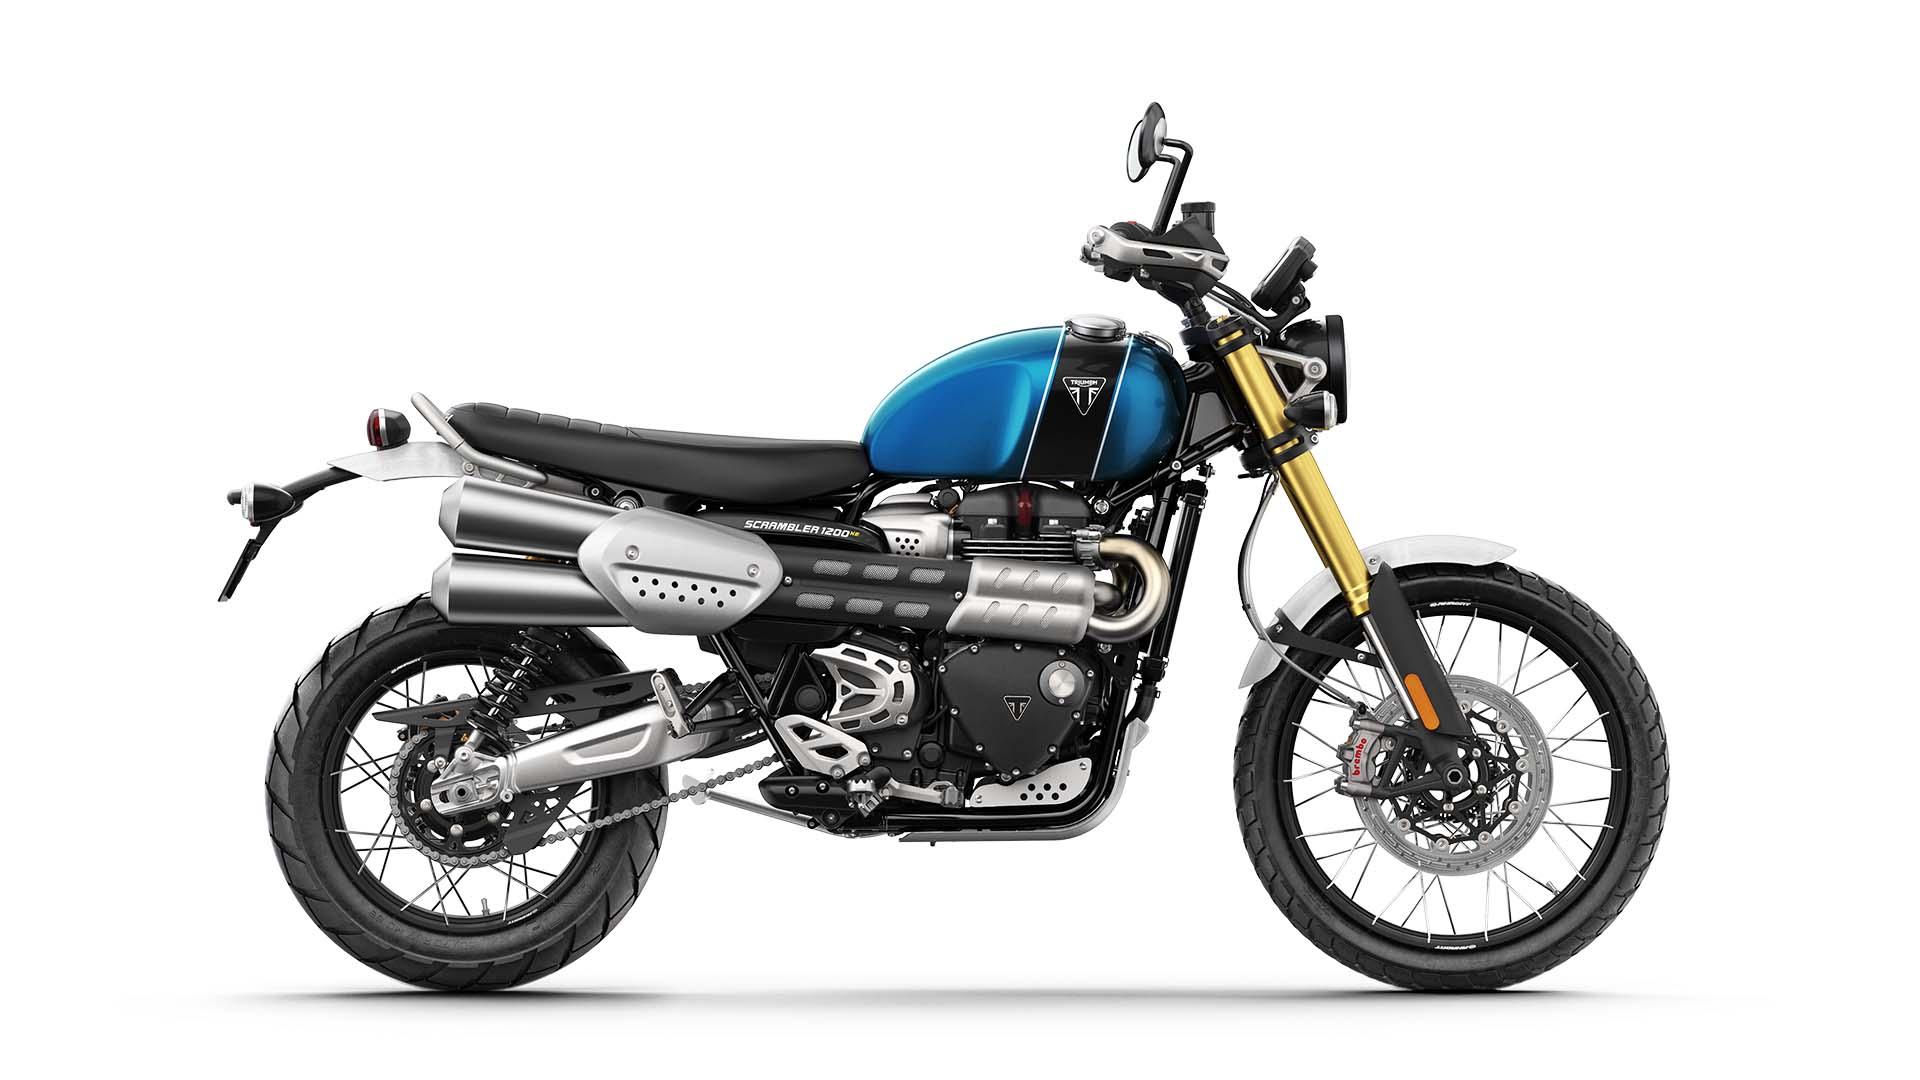 Triumph Scrambler 1200 XE et XC – Essai Moto Magazine